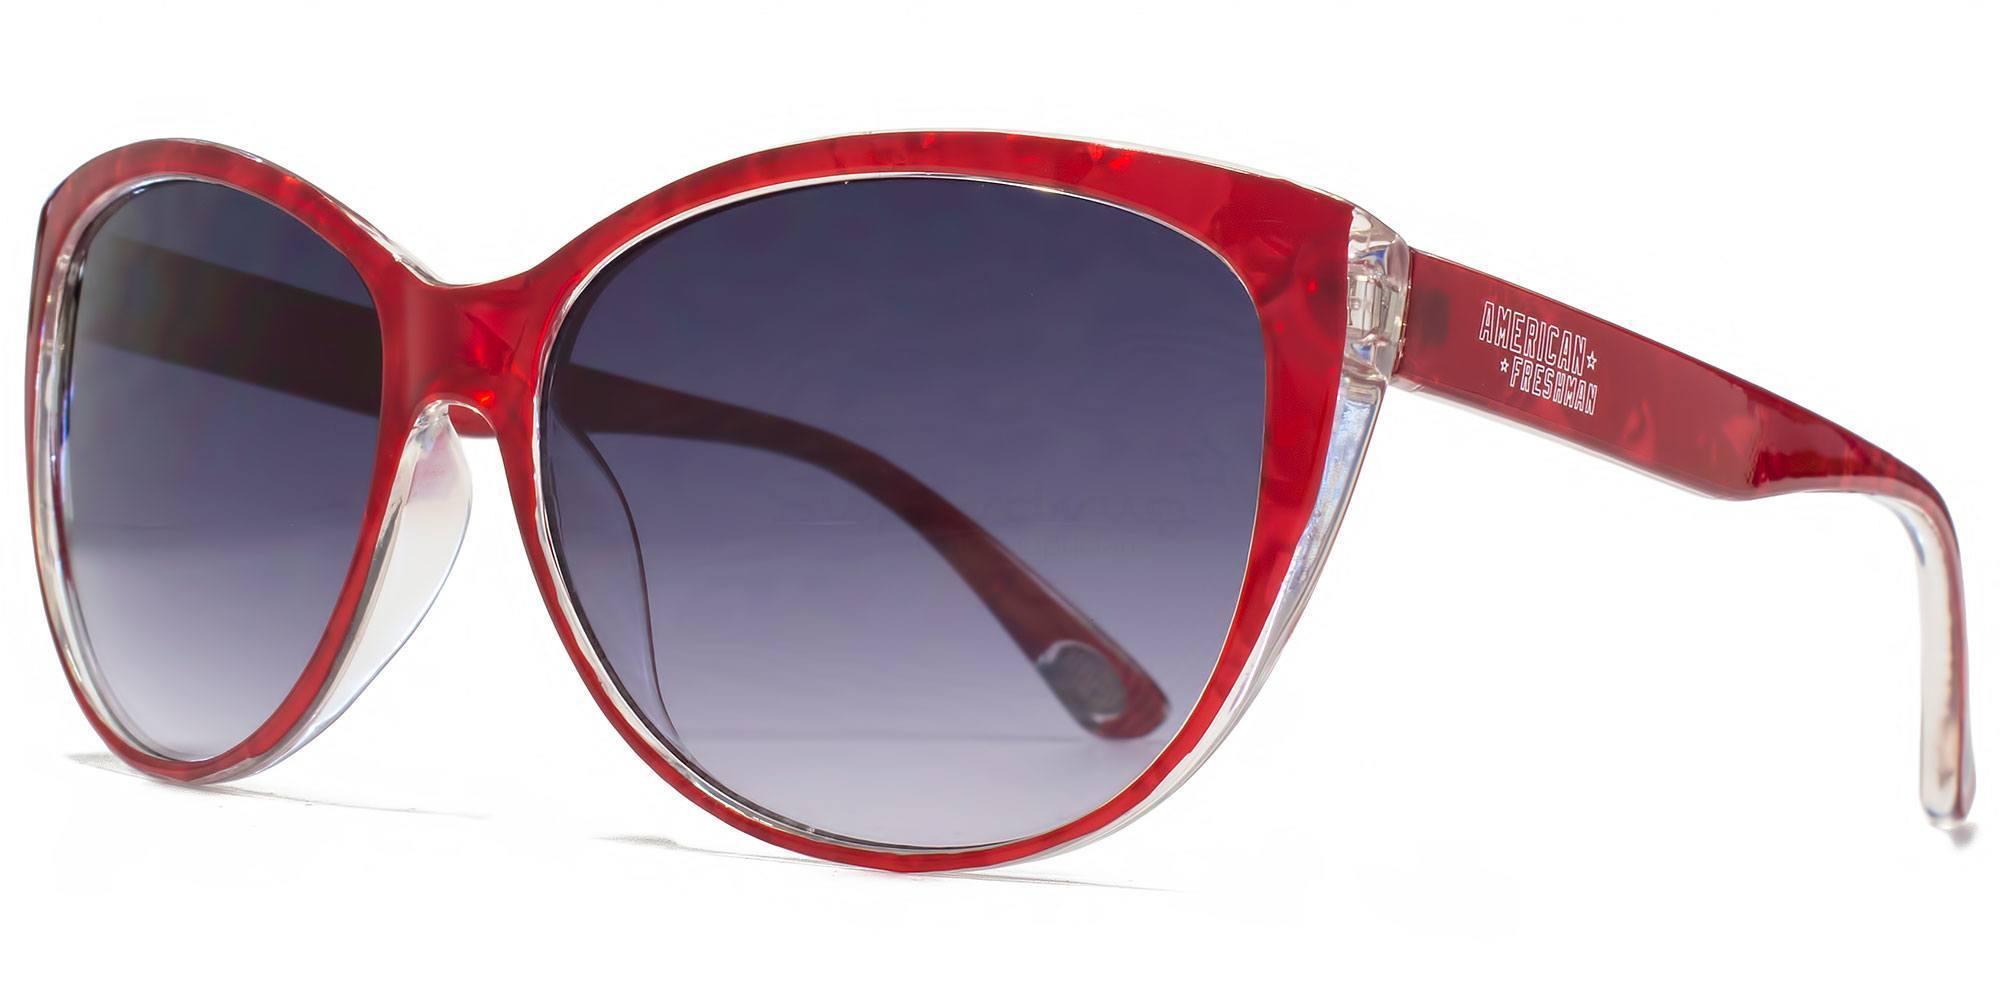 AFS017 MEGAN Sunglasses, American Freshman